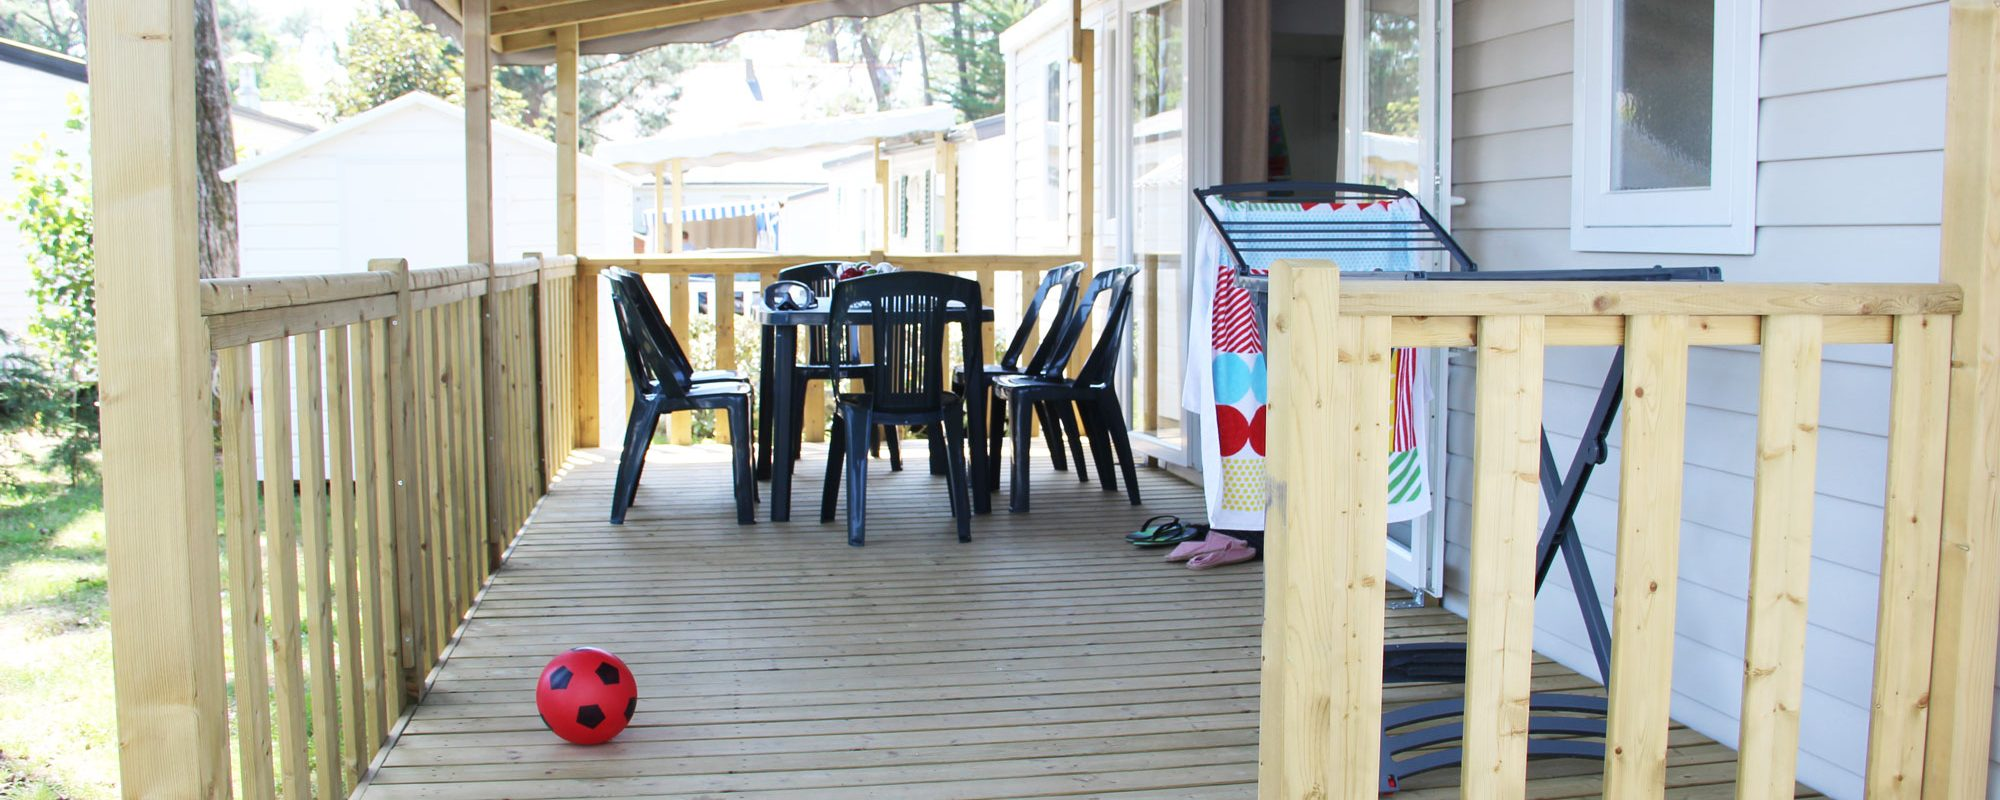 terrasse du mobilhome cordelia en vente camping à proximité de Guérande